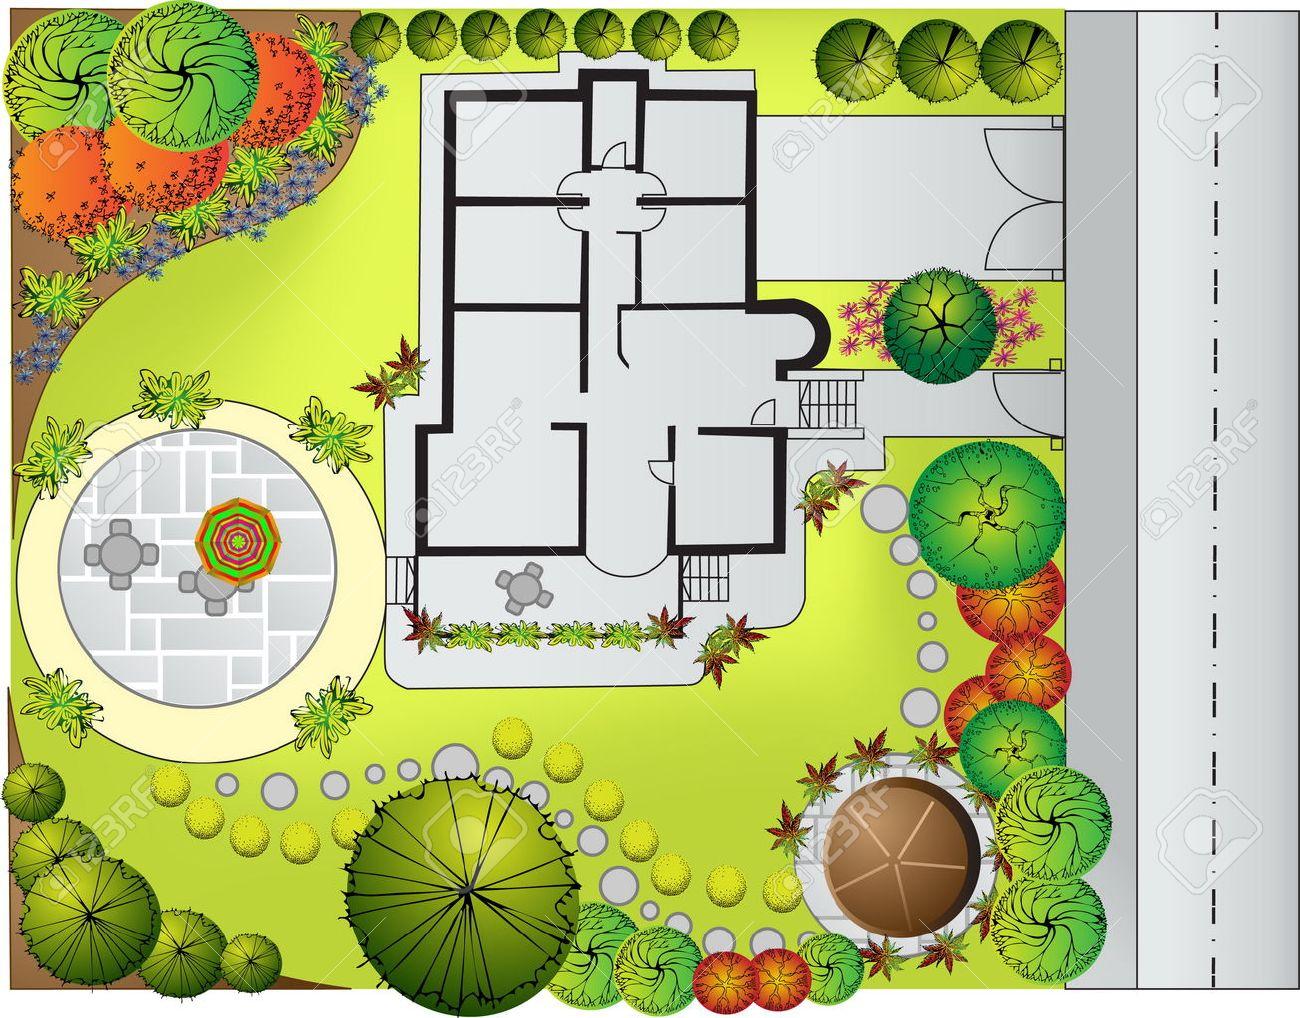 Plan of Landscape and Garden Stock Vector - 9103127